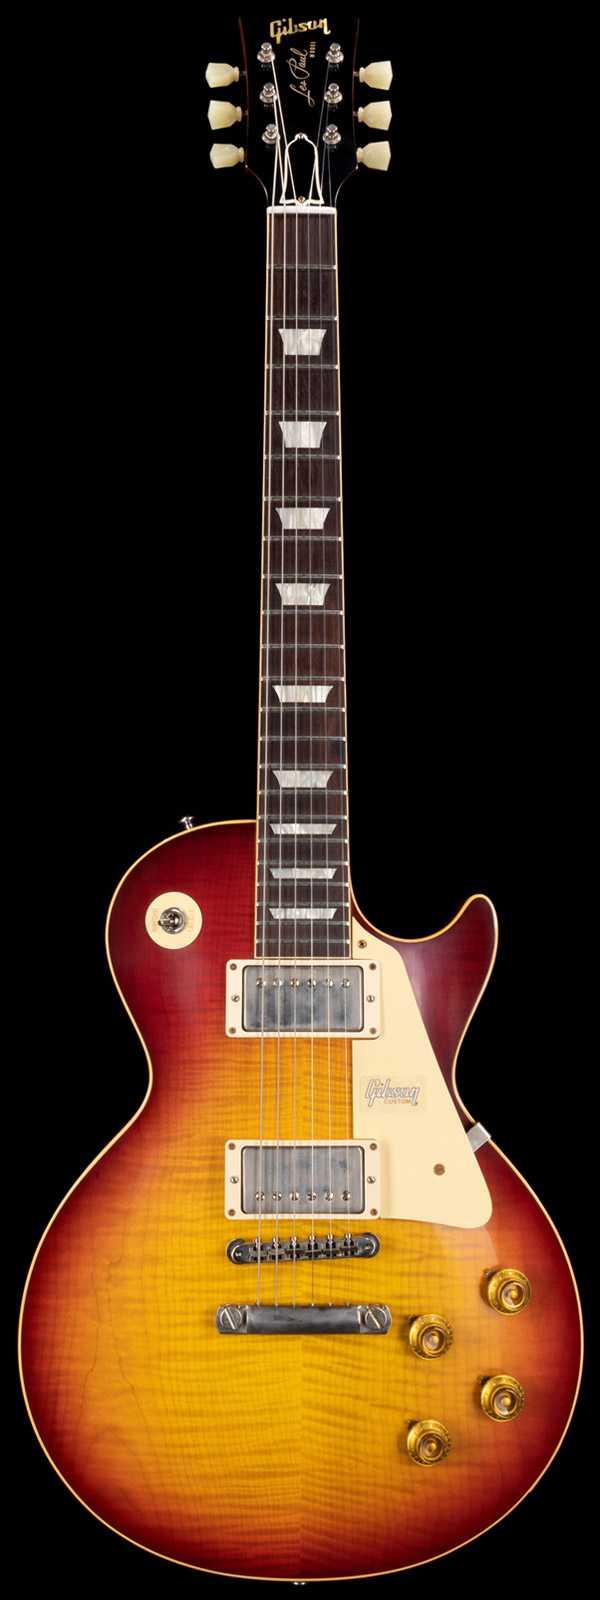 Gibson Custom Shop VOS 1959 Les Paul Standard Vintage Cherry Sunburst